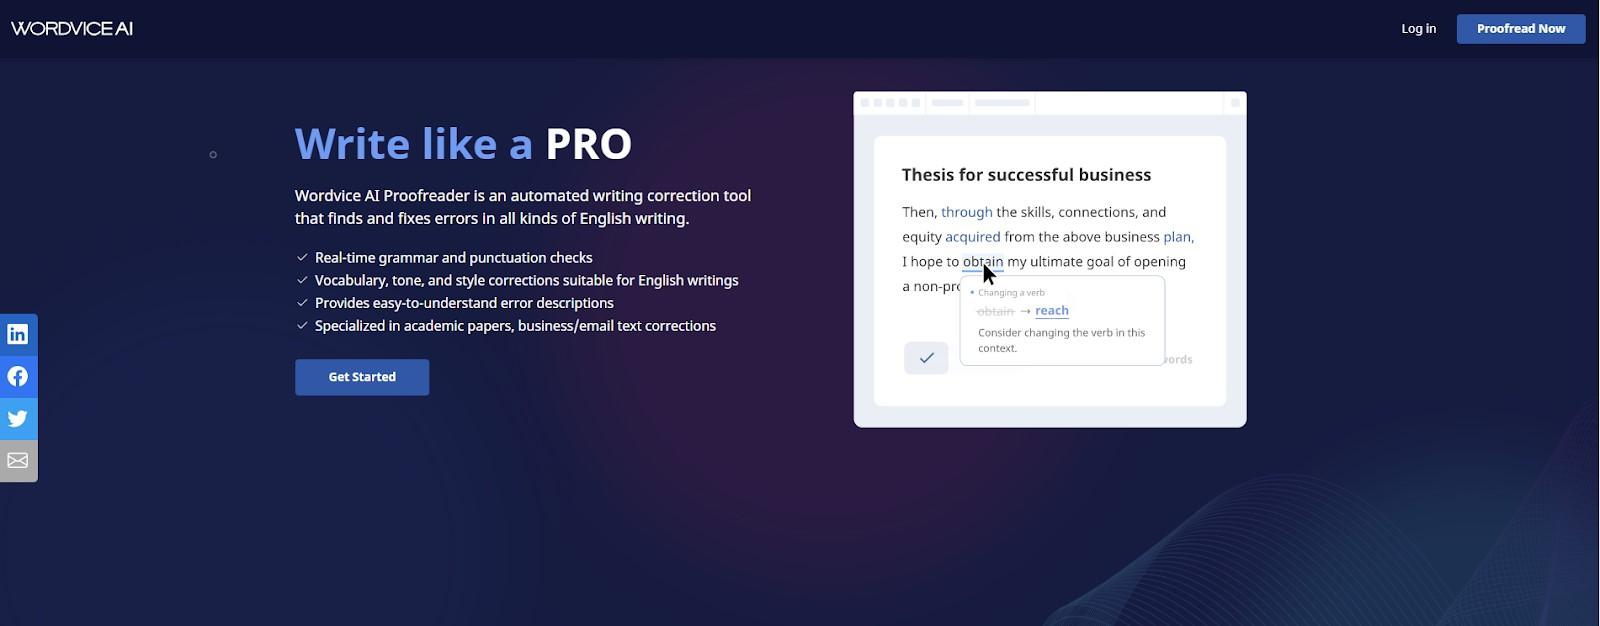 wordvice.ai main page screenshot